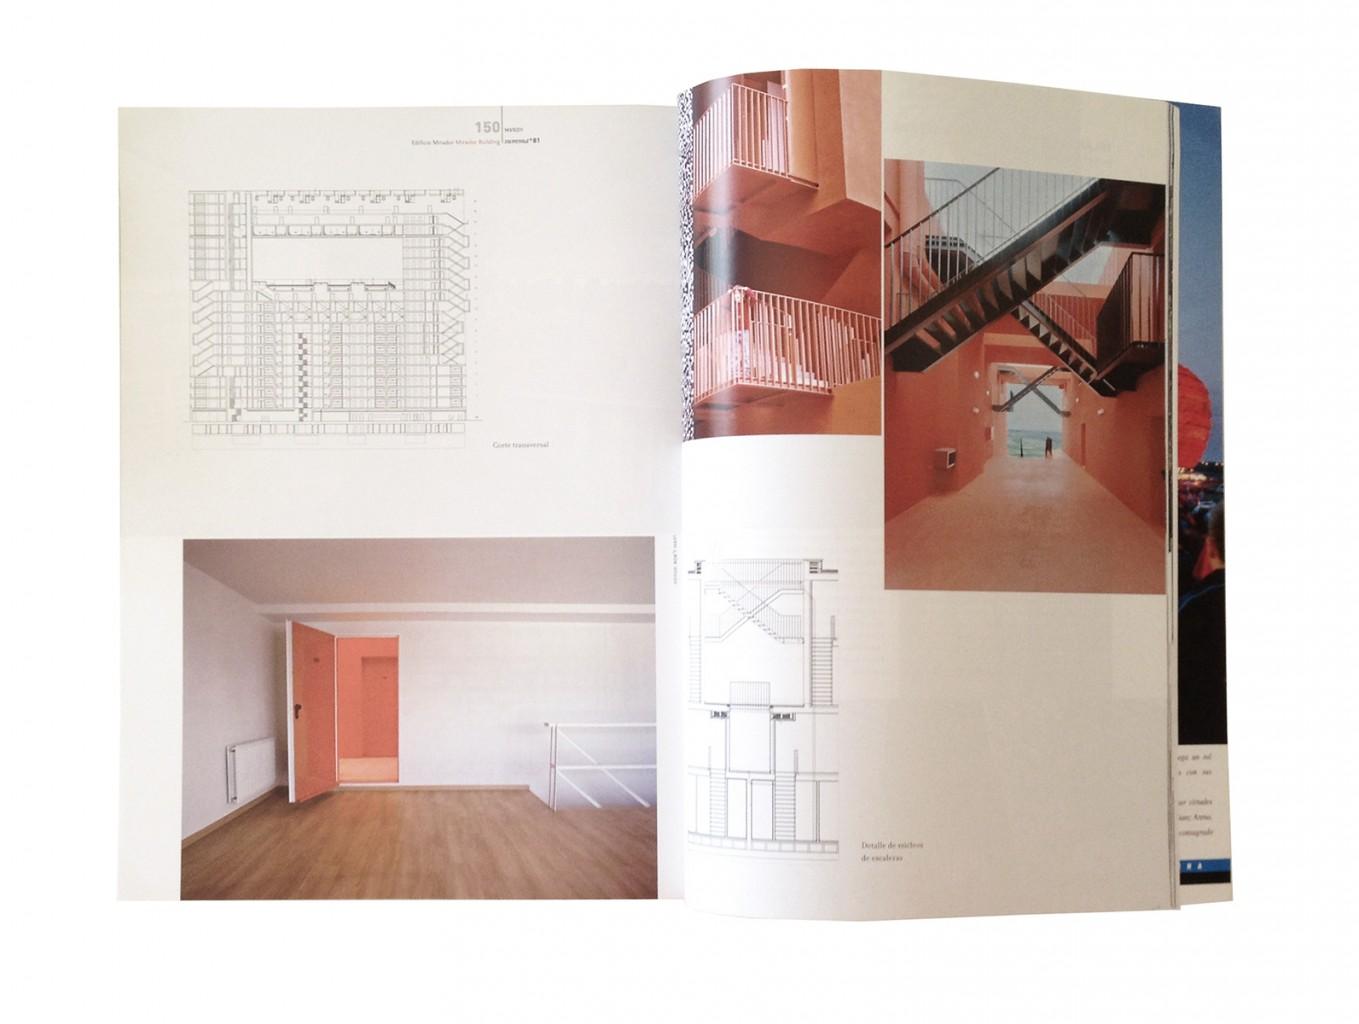 Edificio mirador Summa+81 Blanca Lleo MVRDV 01